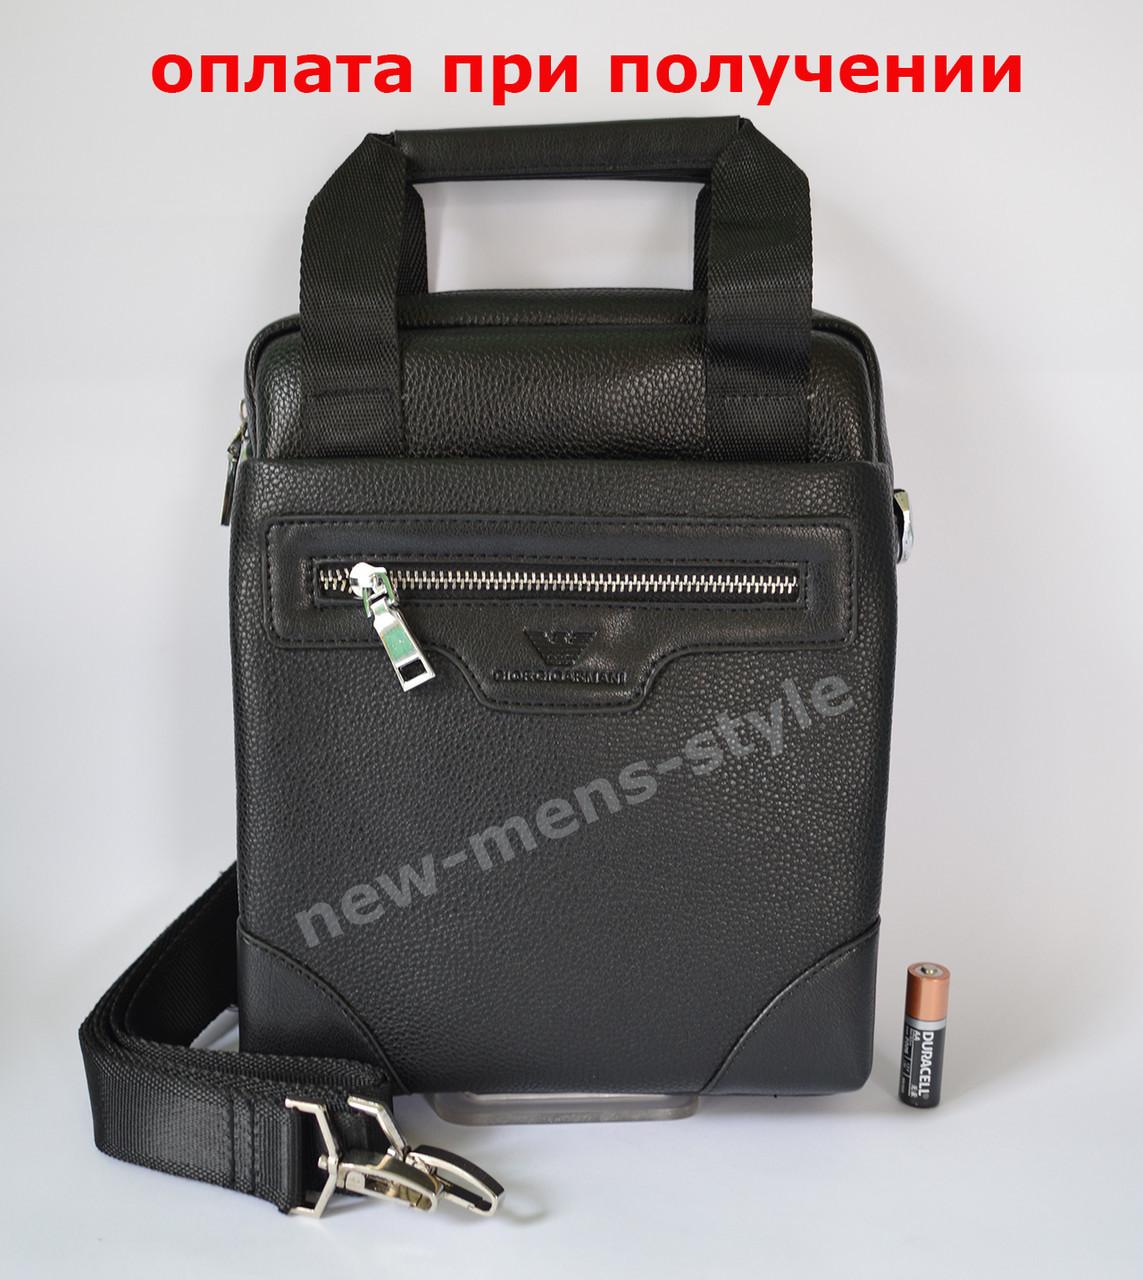 a14cbc1493be Мужская кожаная фирменная сумка барсетка Giorgio Armani Polo купить ...